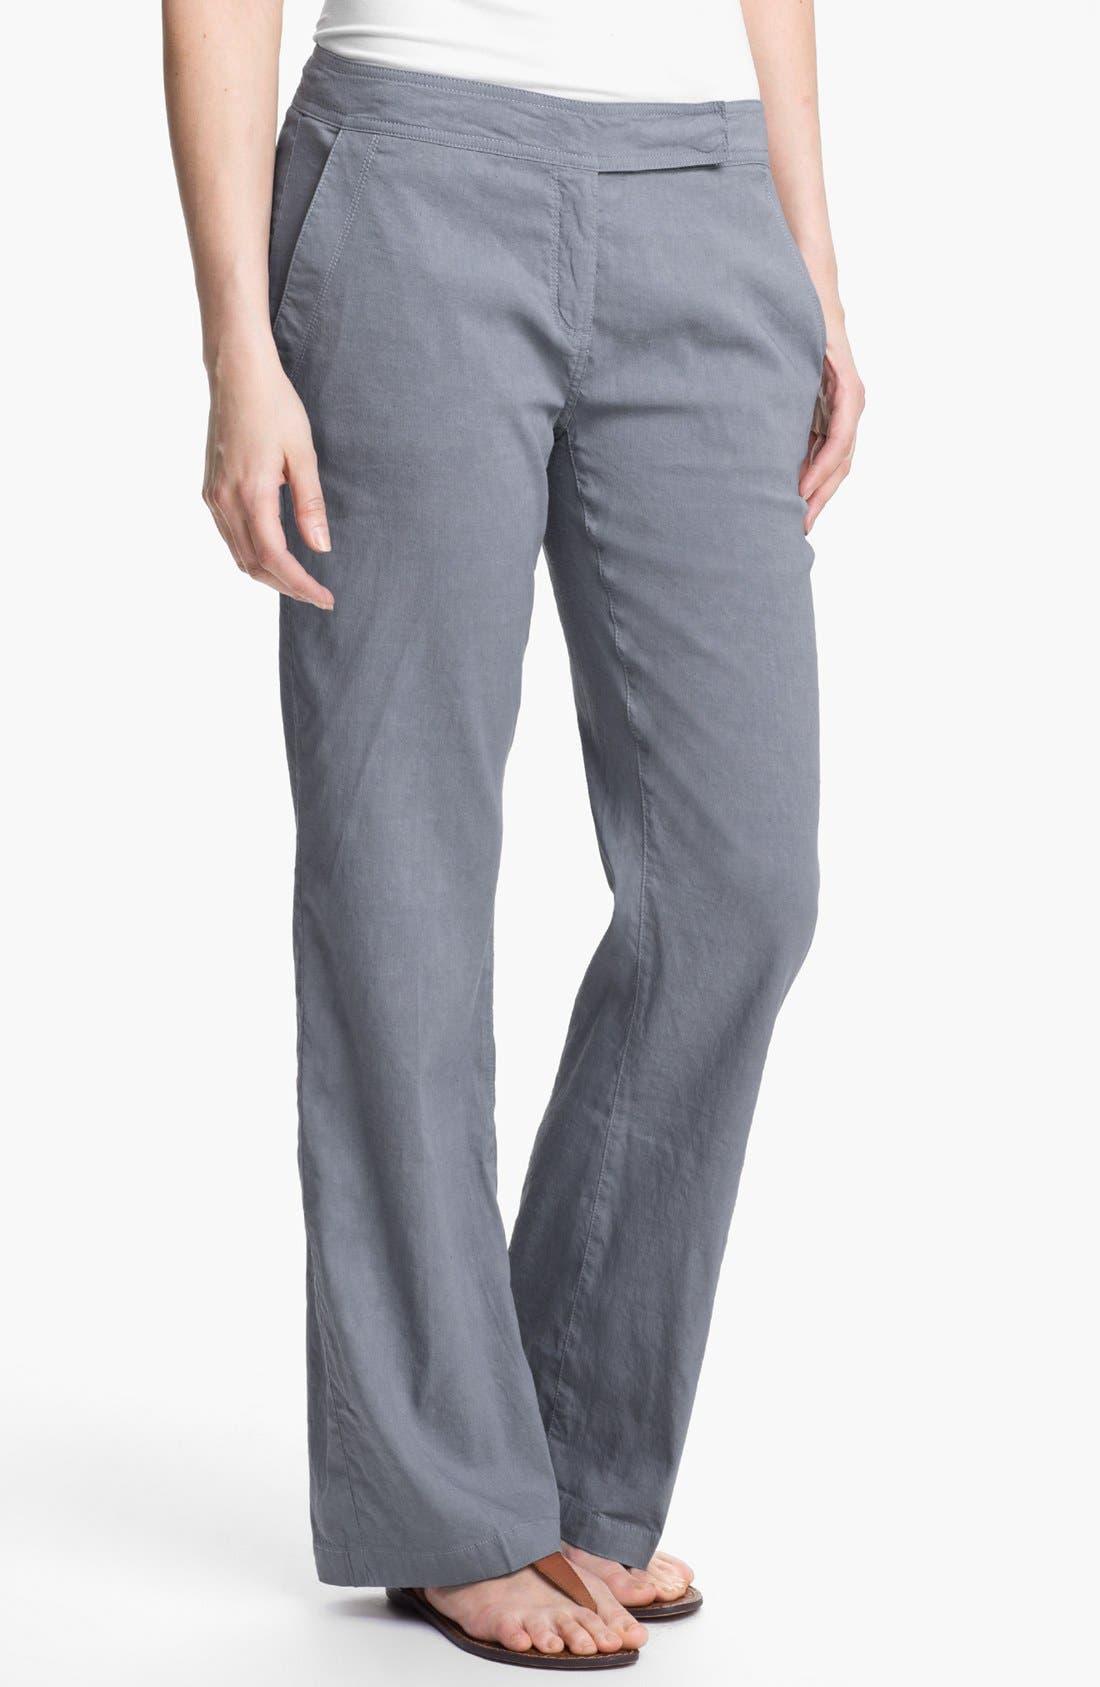 Alternate Image 1 Selected - Eileen Fisher Linen Blend Trousers (Regular & Petite)